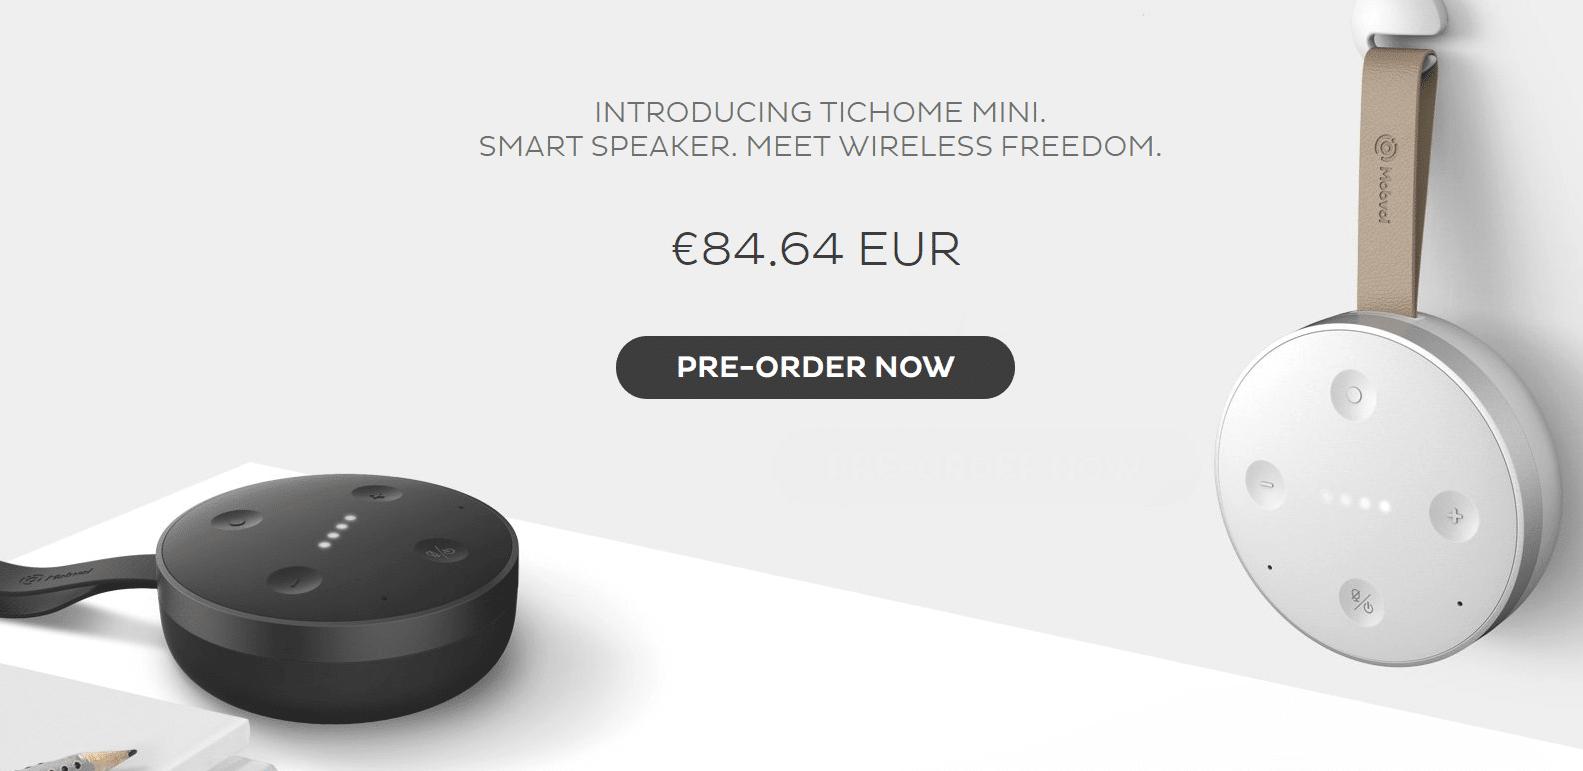 tichome mini la premi re enceinte google assistant portable. Black Bedroom Furniture Sets. Home Design Ideas